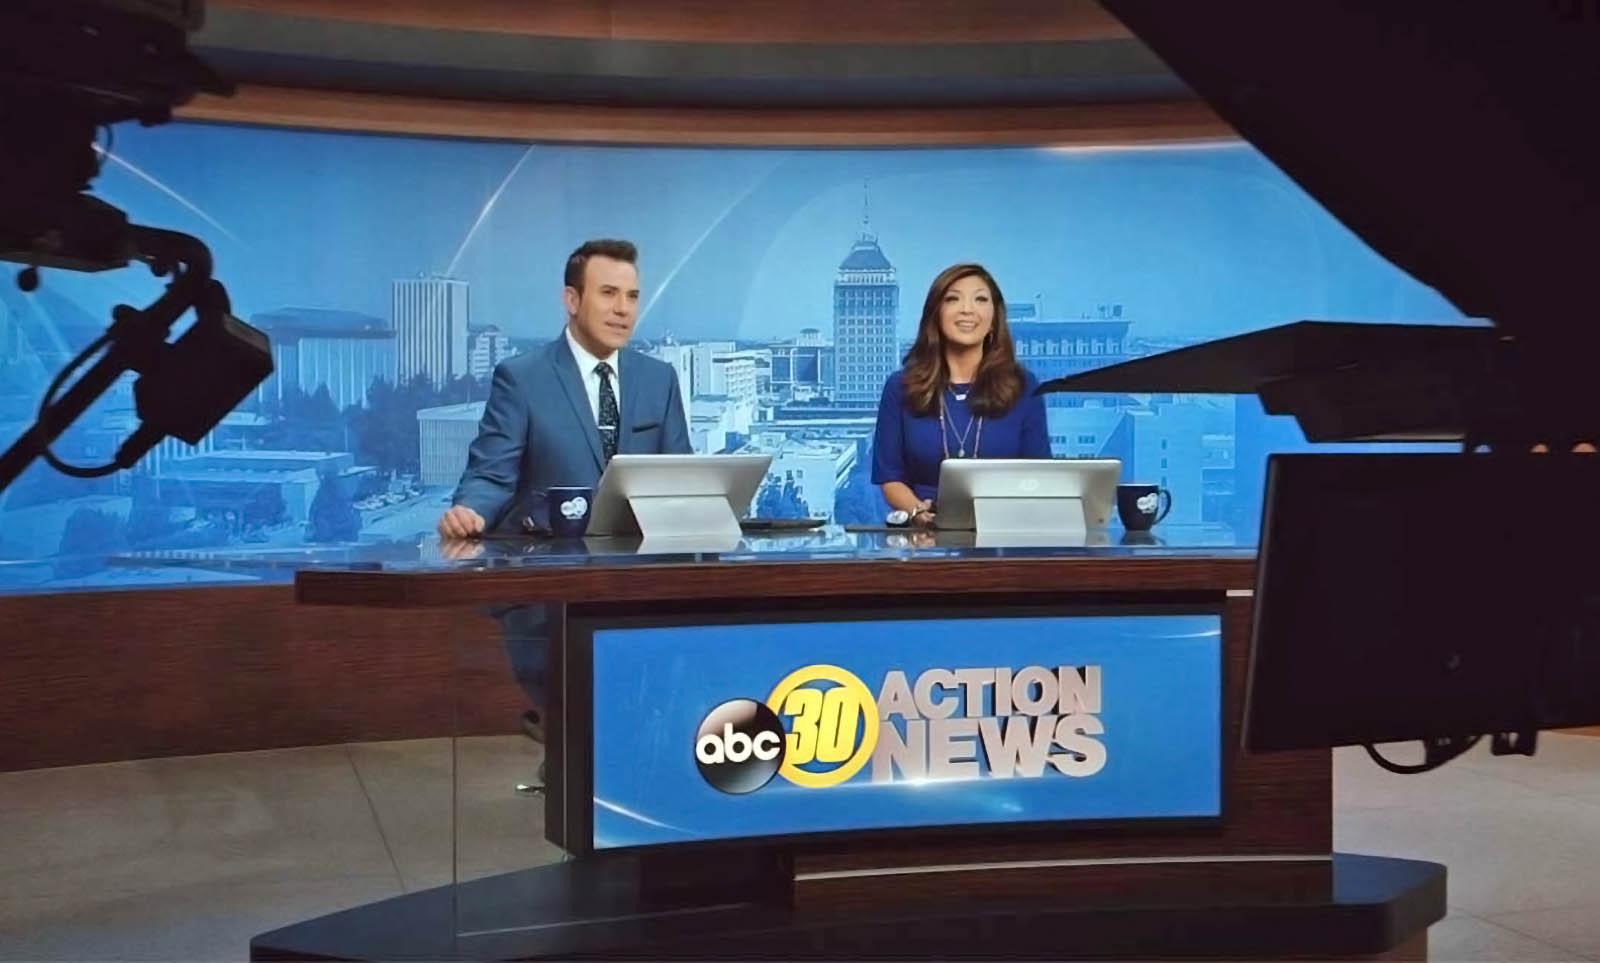 ABC30 News Fresno Newscaster in Studio